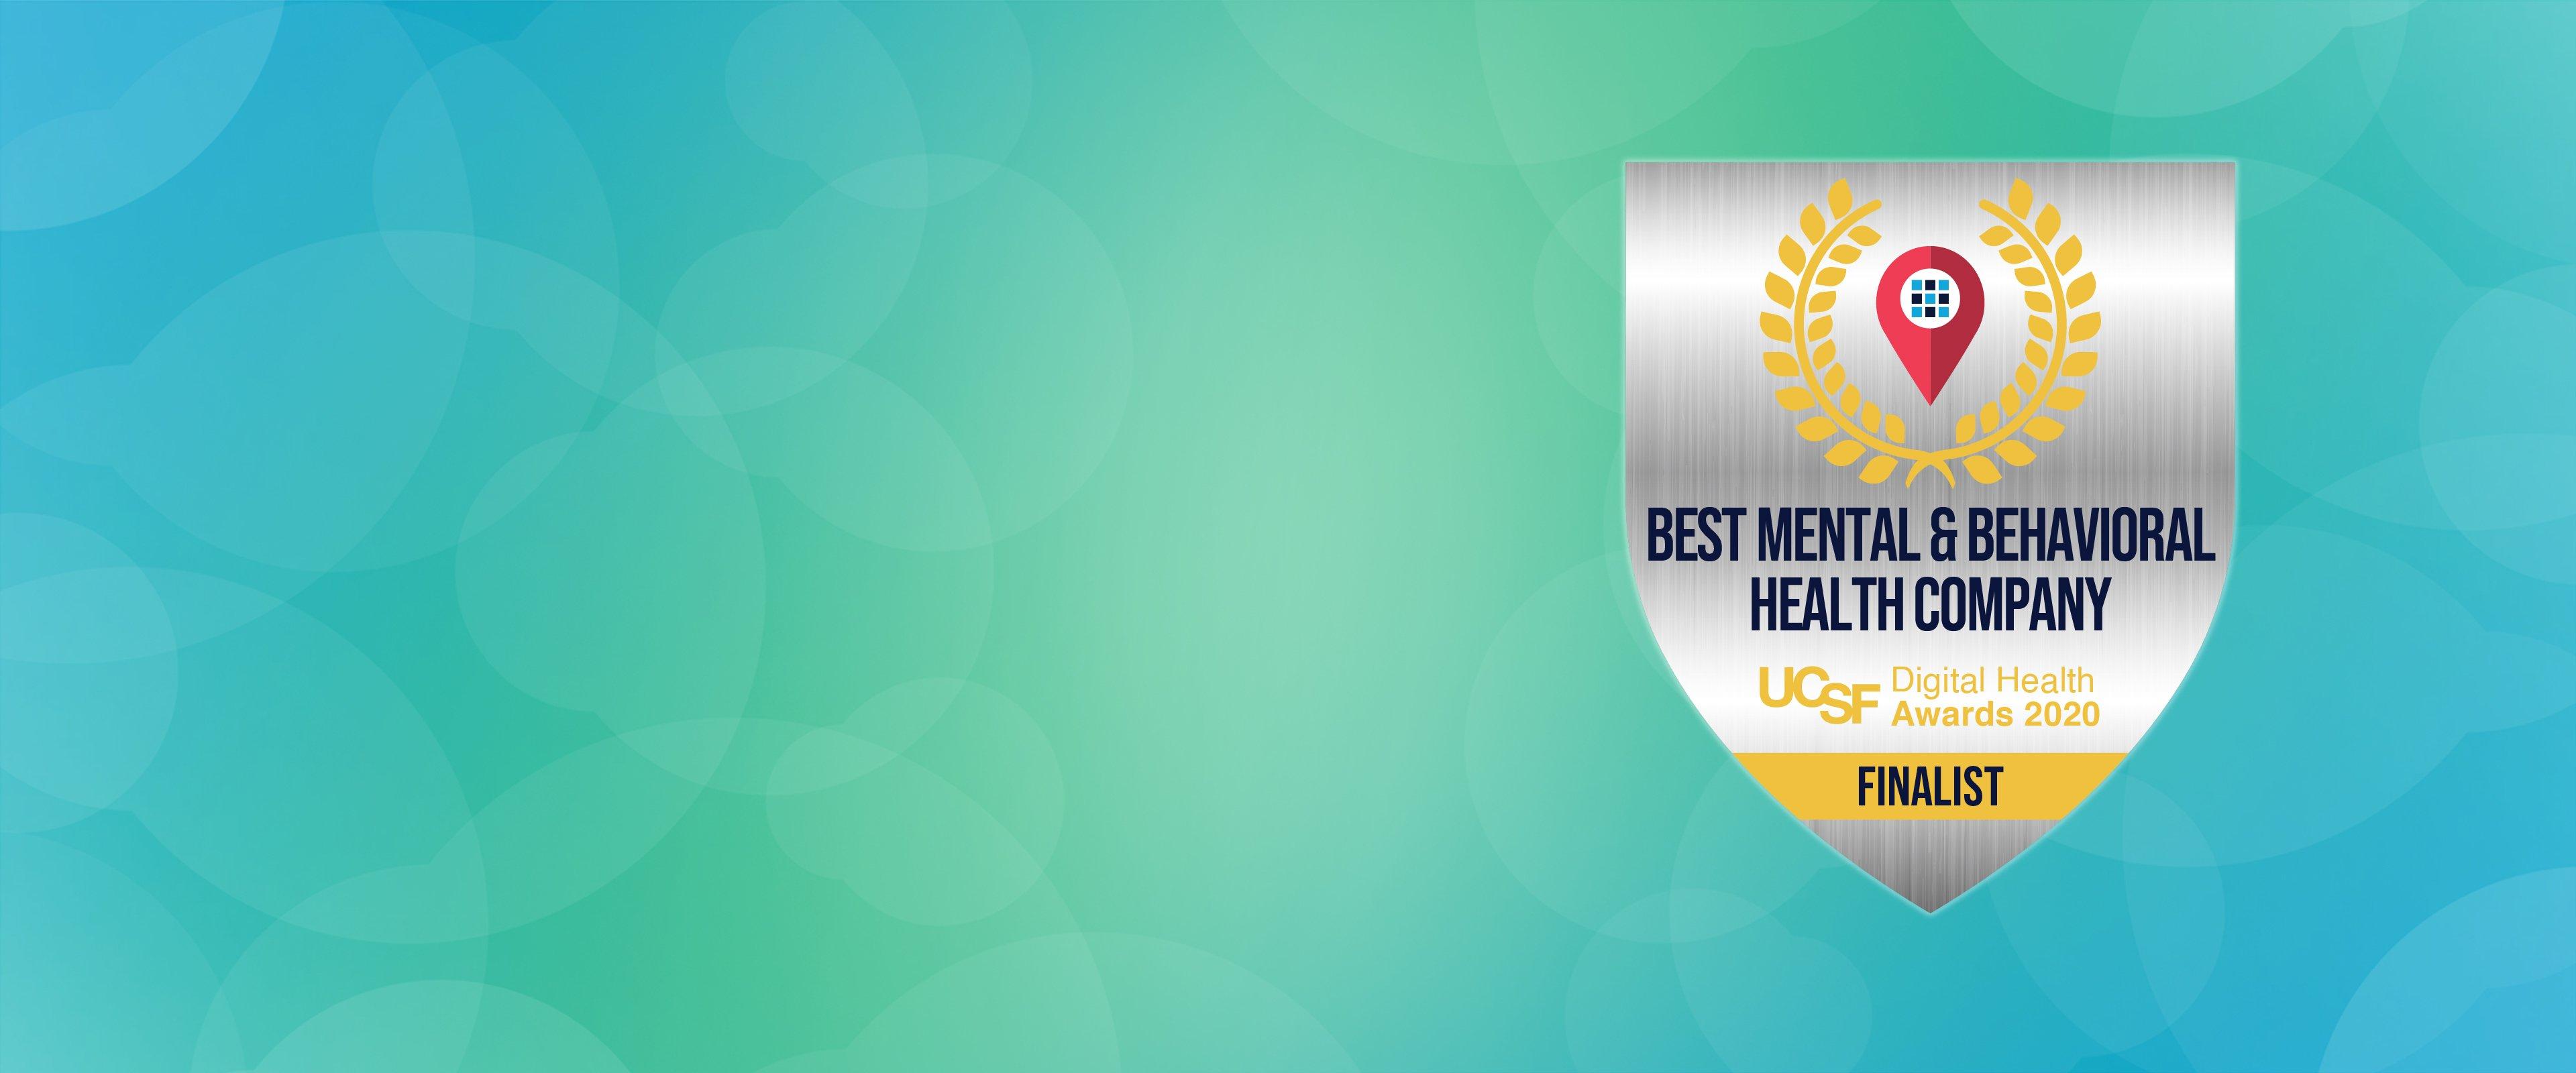 ucsf awards